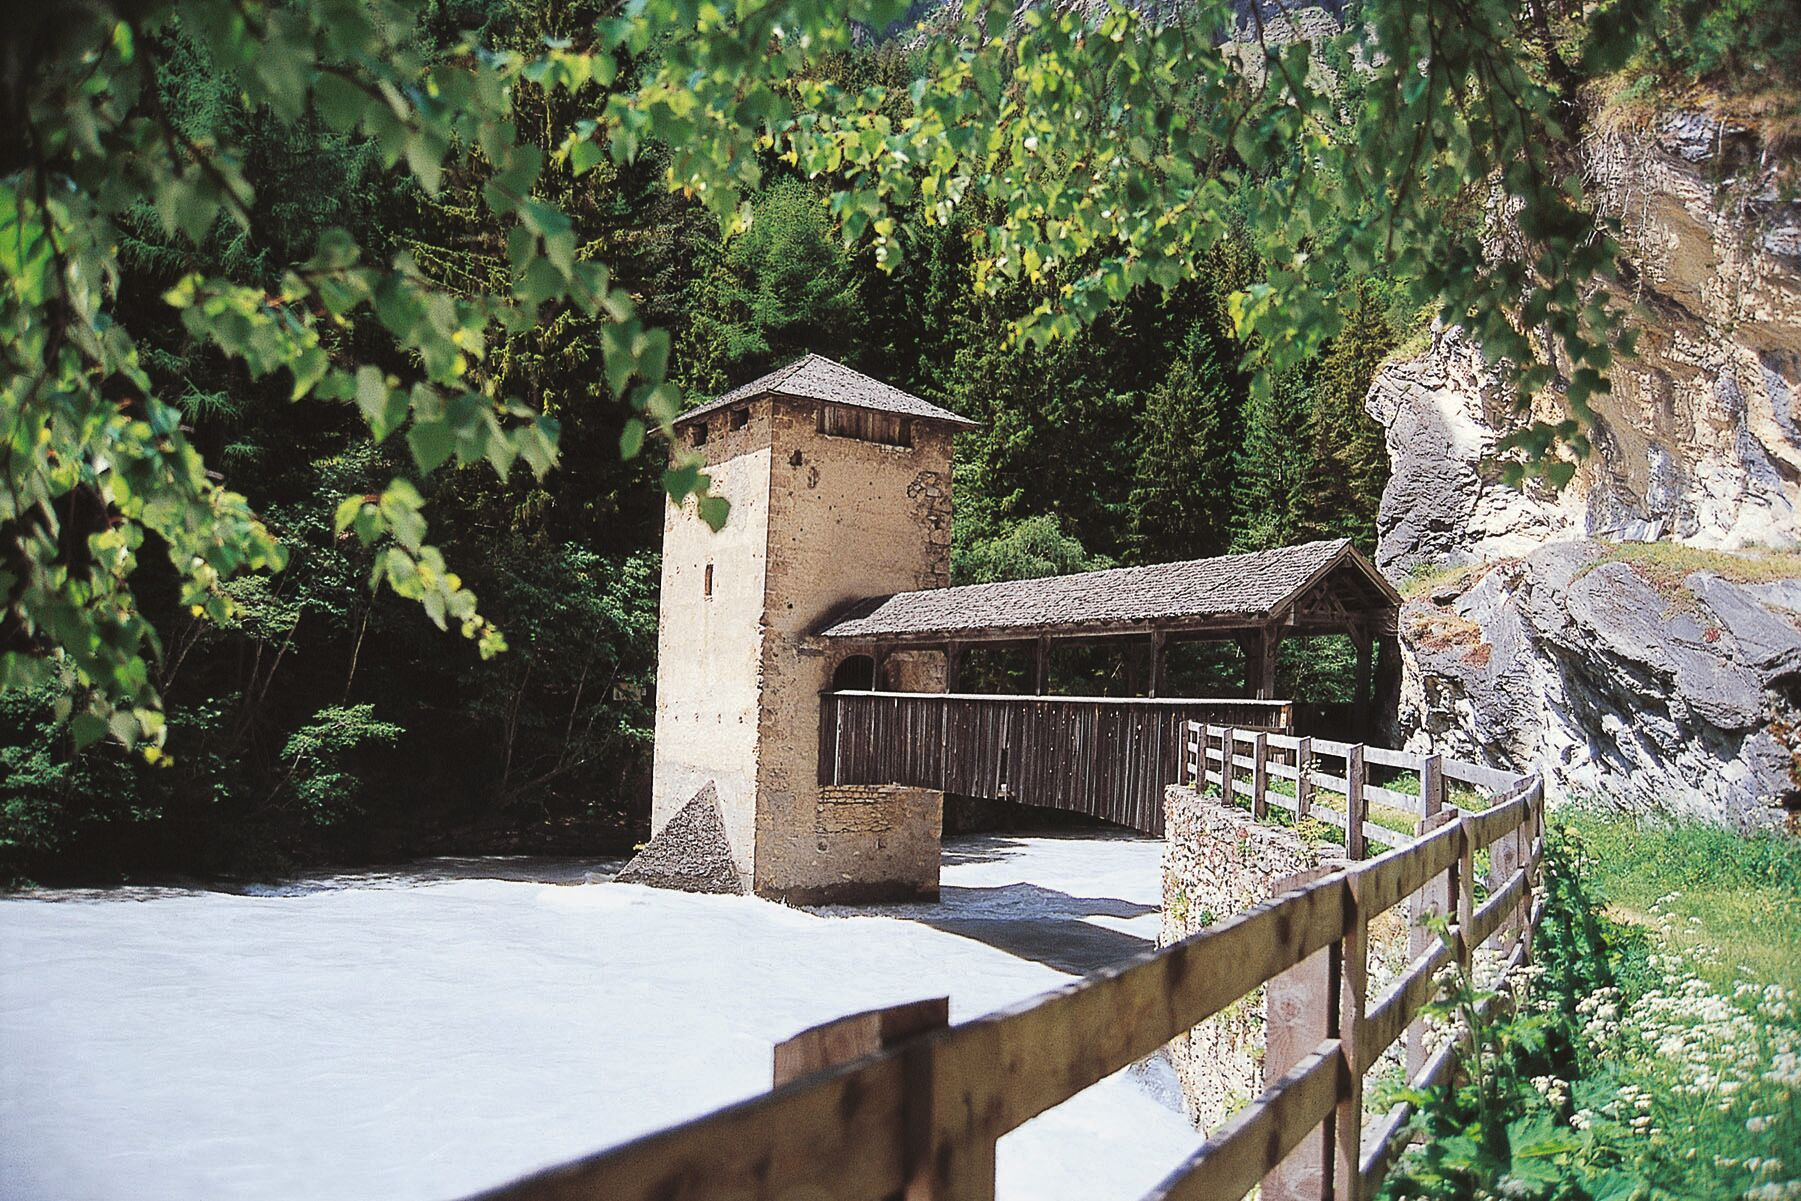 Zollstation Altfinstermünz, Tirol - Via Claudia Augusta